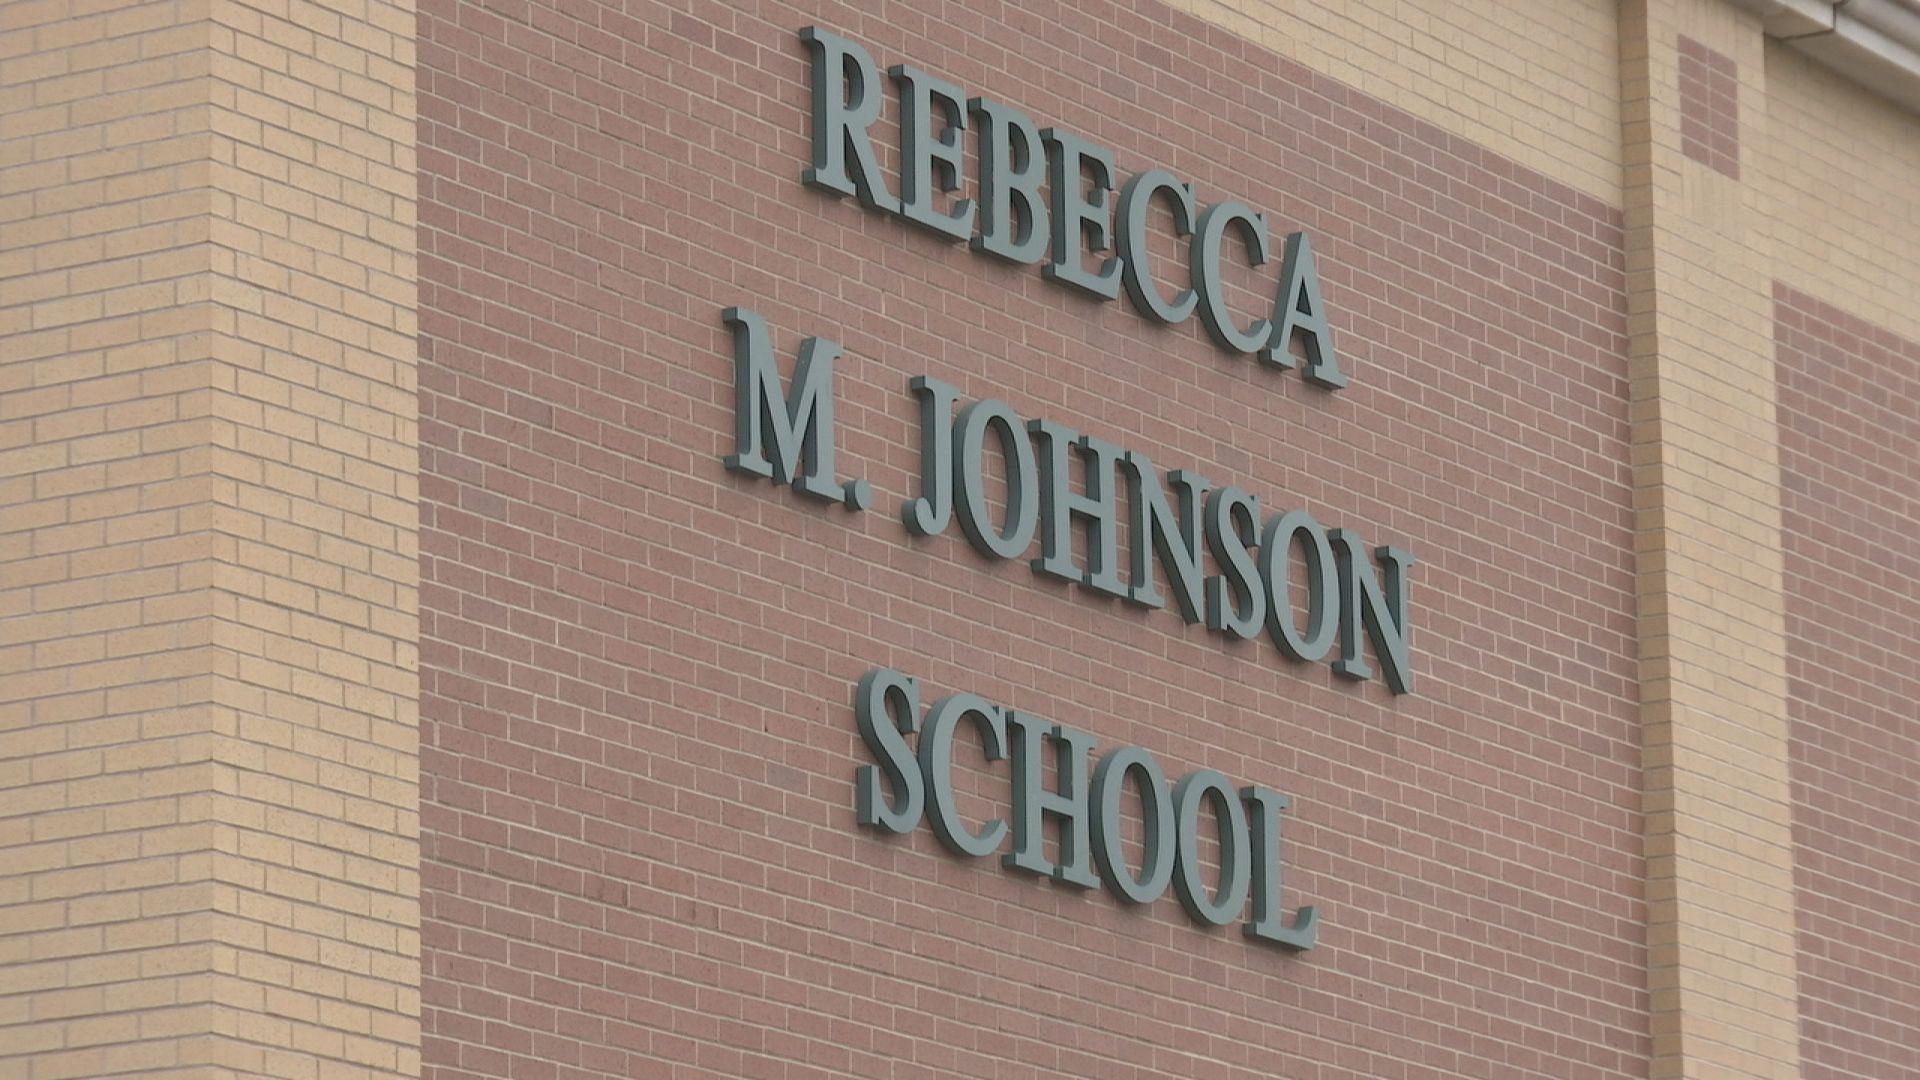 Rebecca johnson school_1554495560065.jpg.jpg